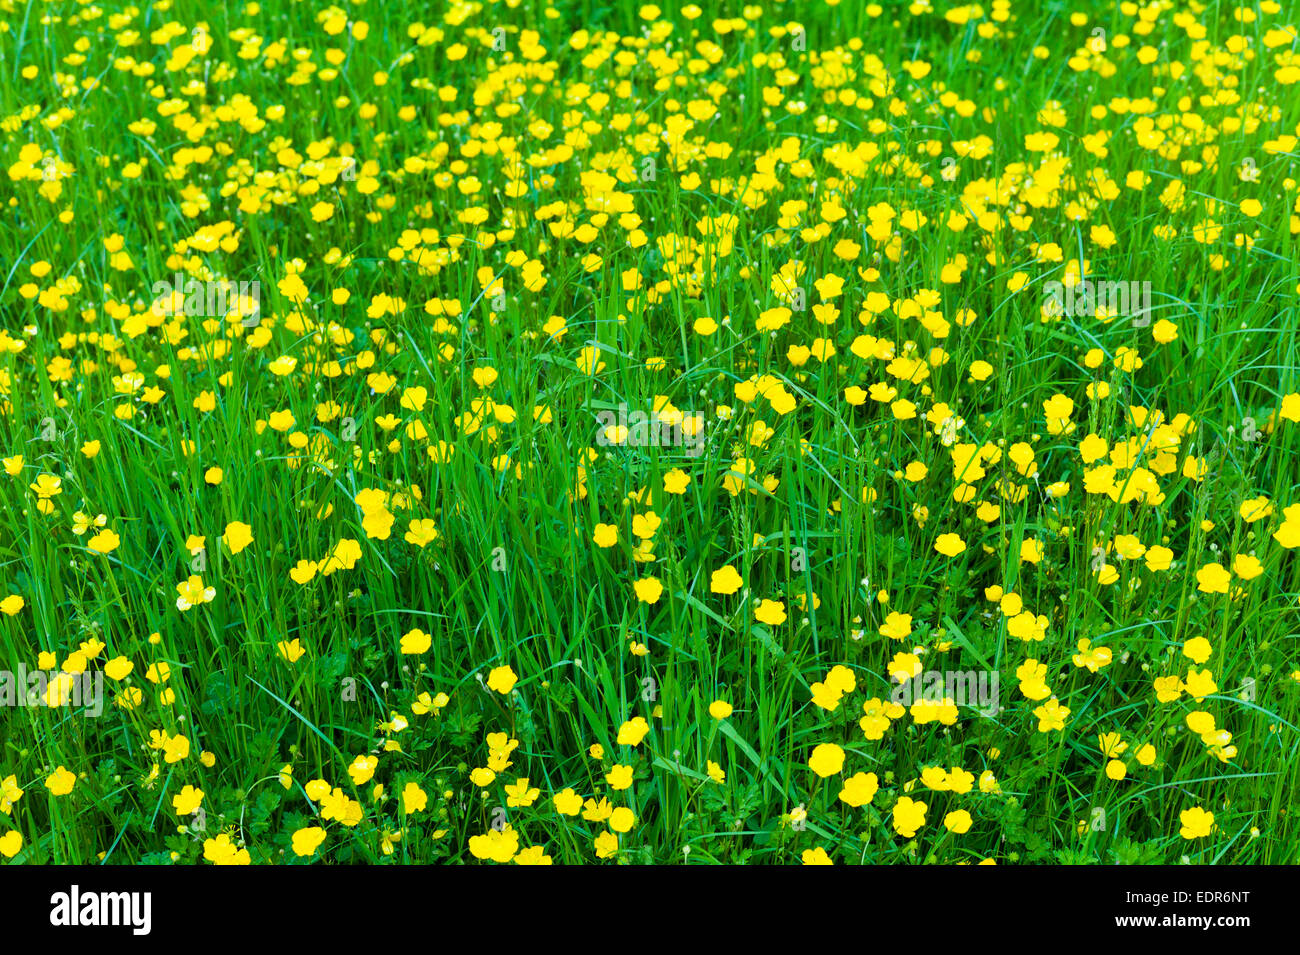 Meadow buttercups, Ranunculus acris, in summertime, UK - Stock Image